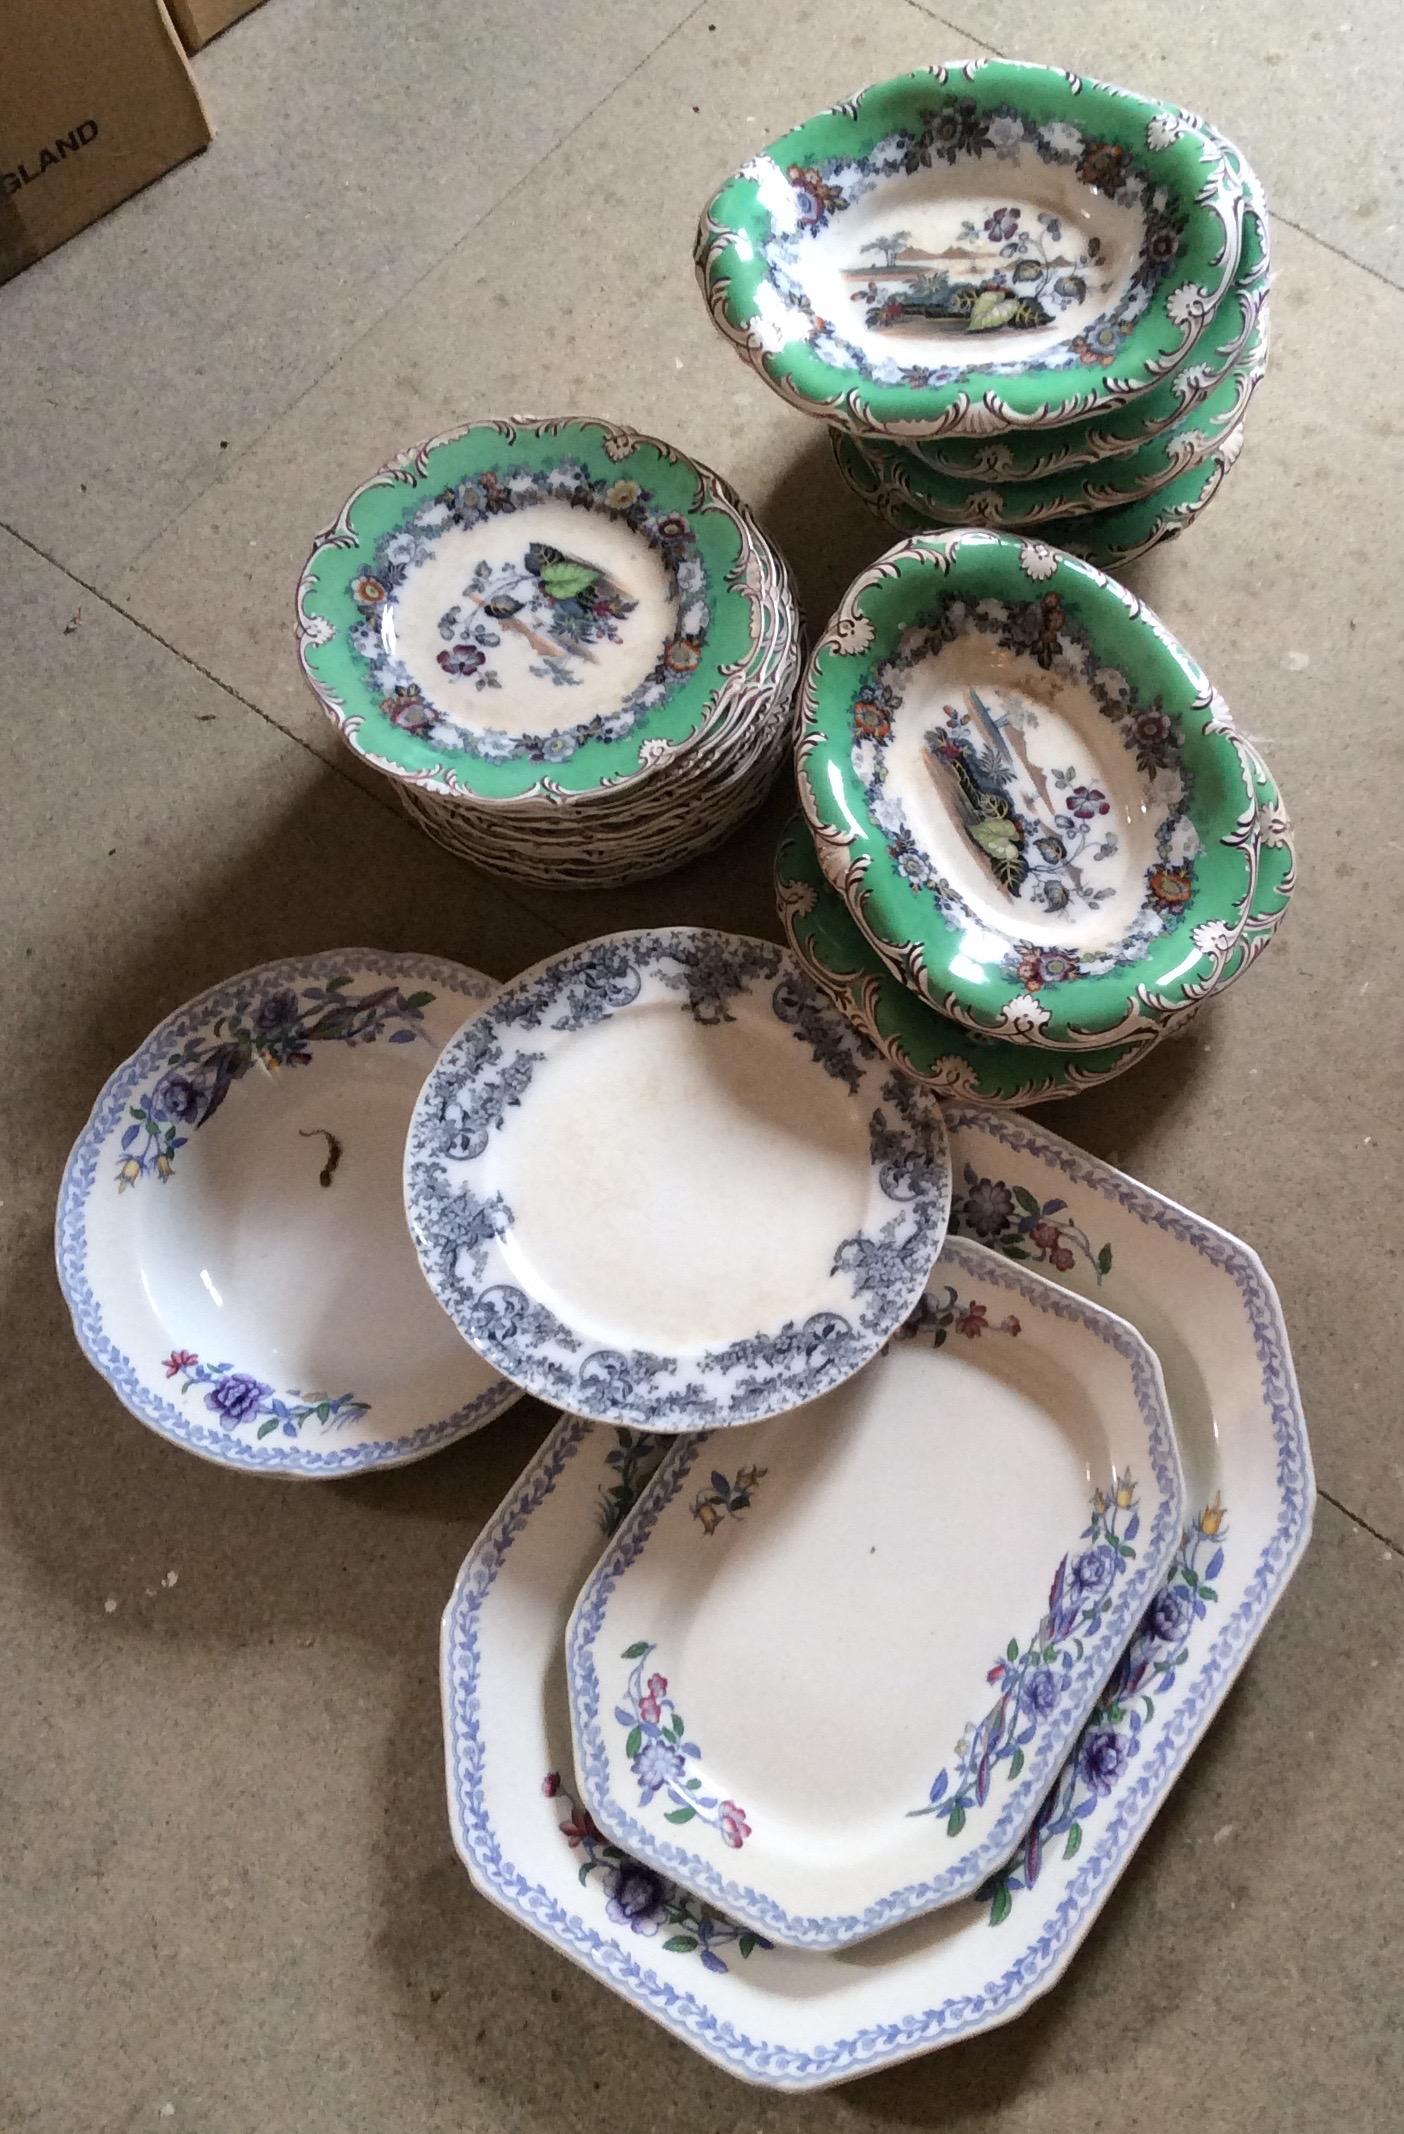 Lot 11 - Large quantity of dinner ware inc. platters etc.